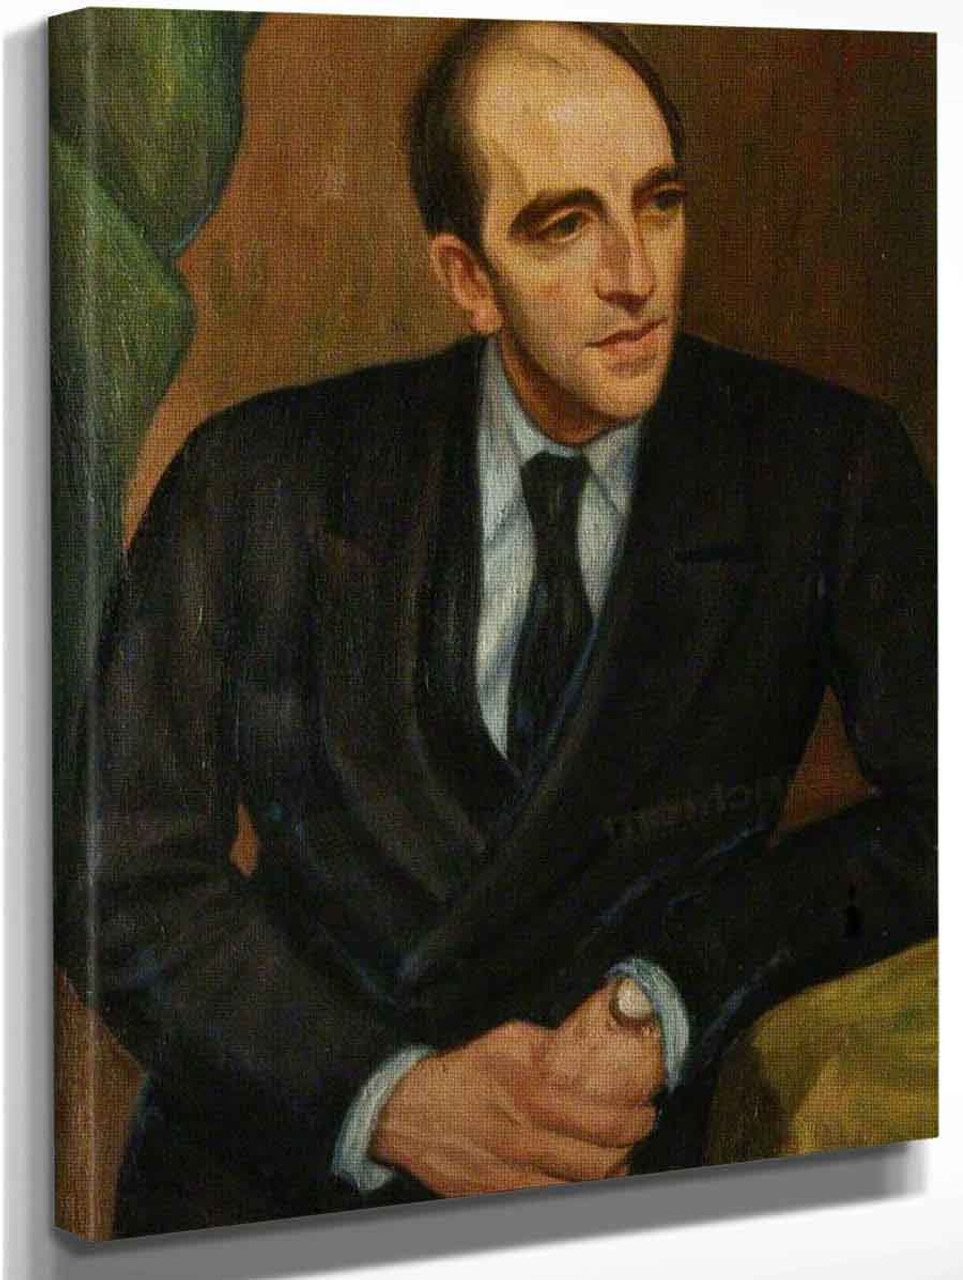 Portrait Of John Nicolas Mavrogordato By Mark Gertler Art Reproduction